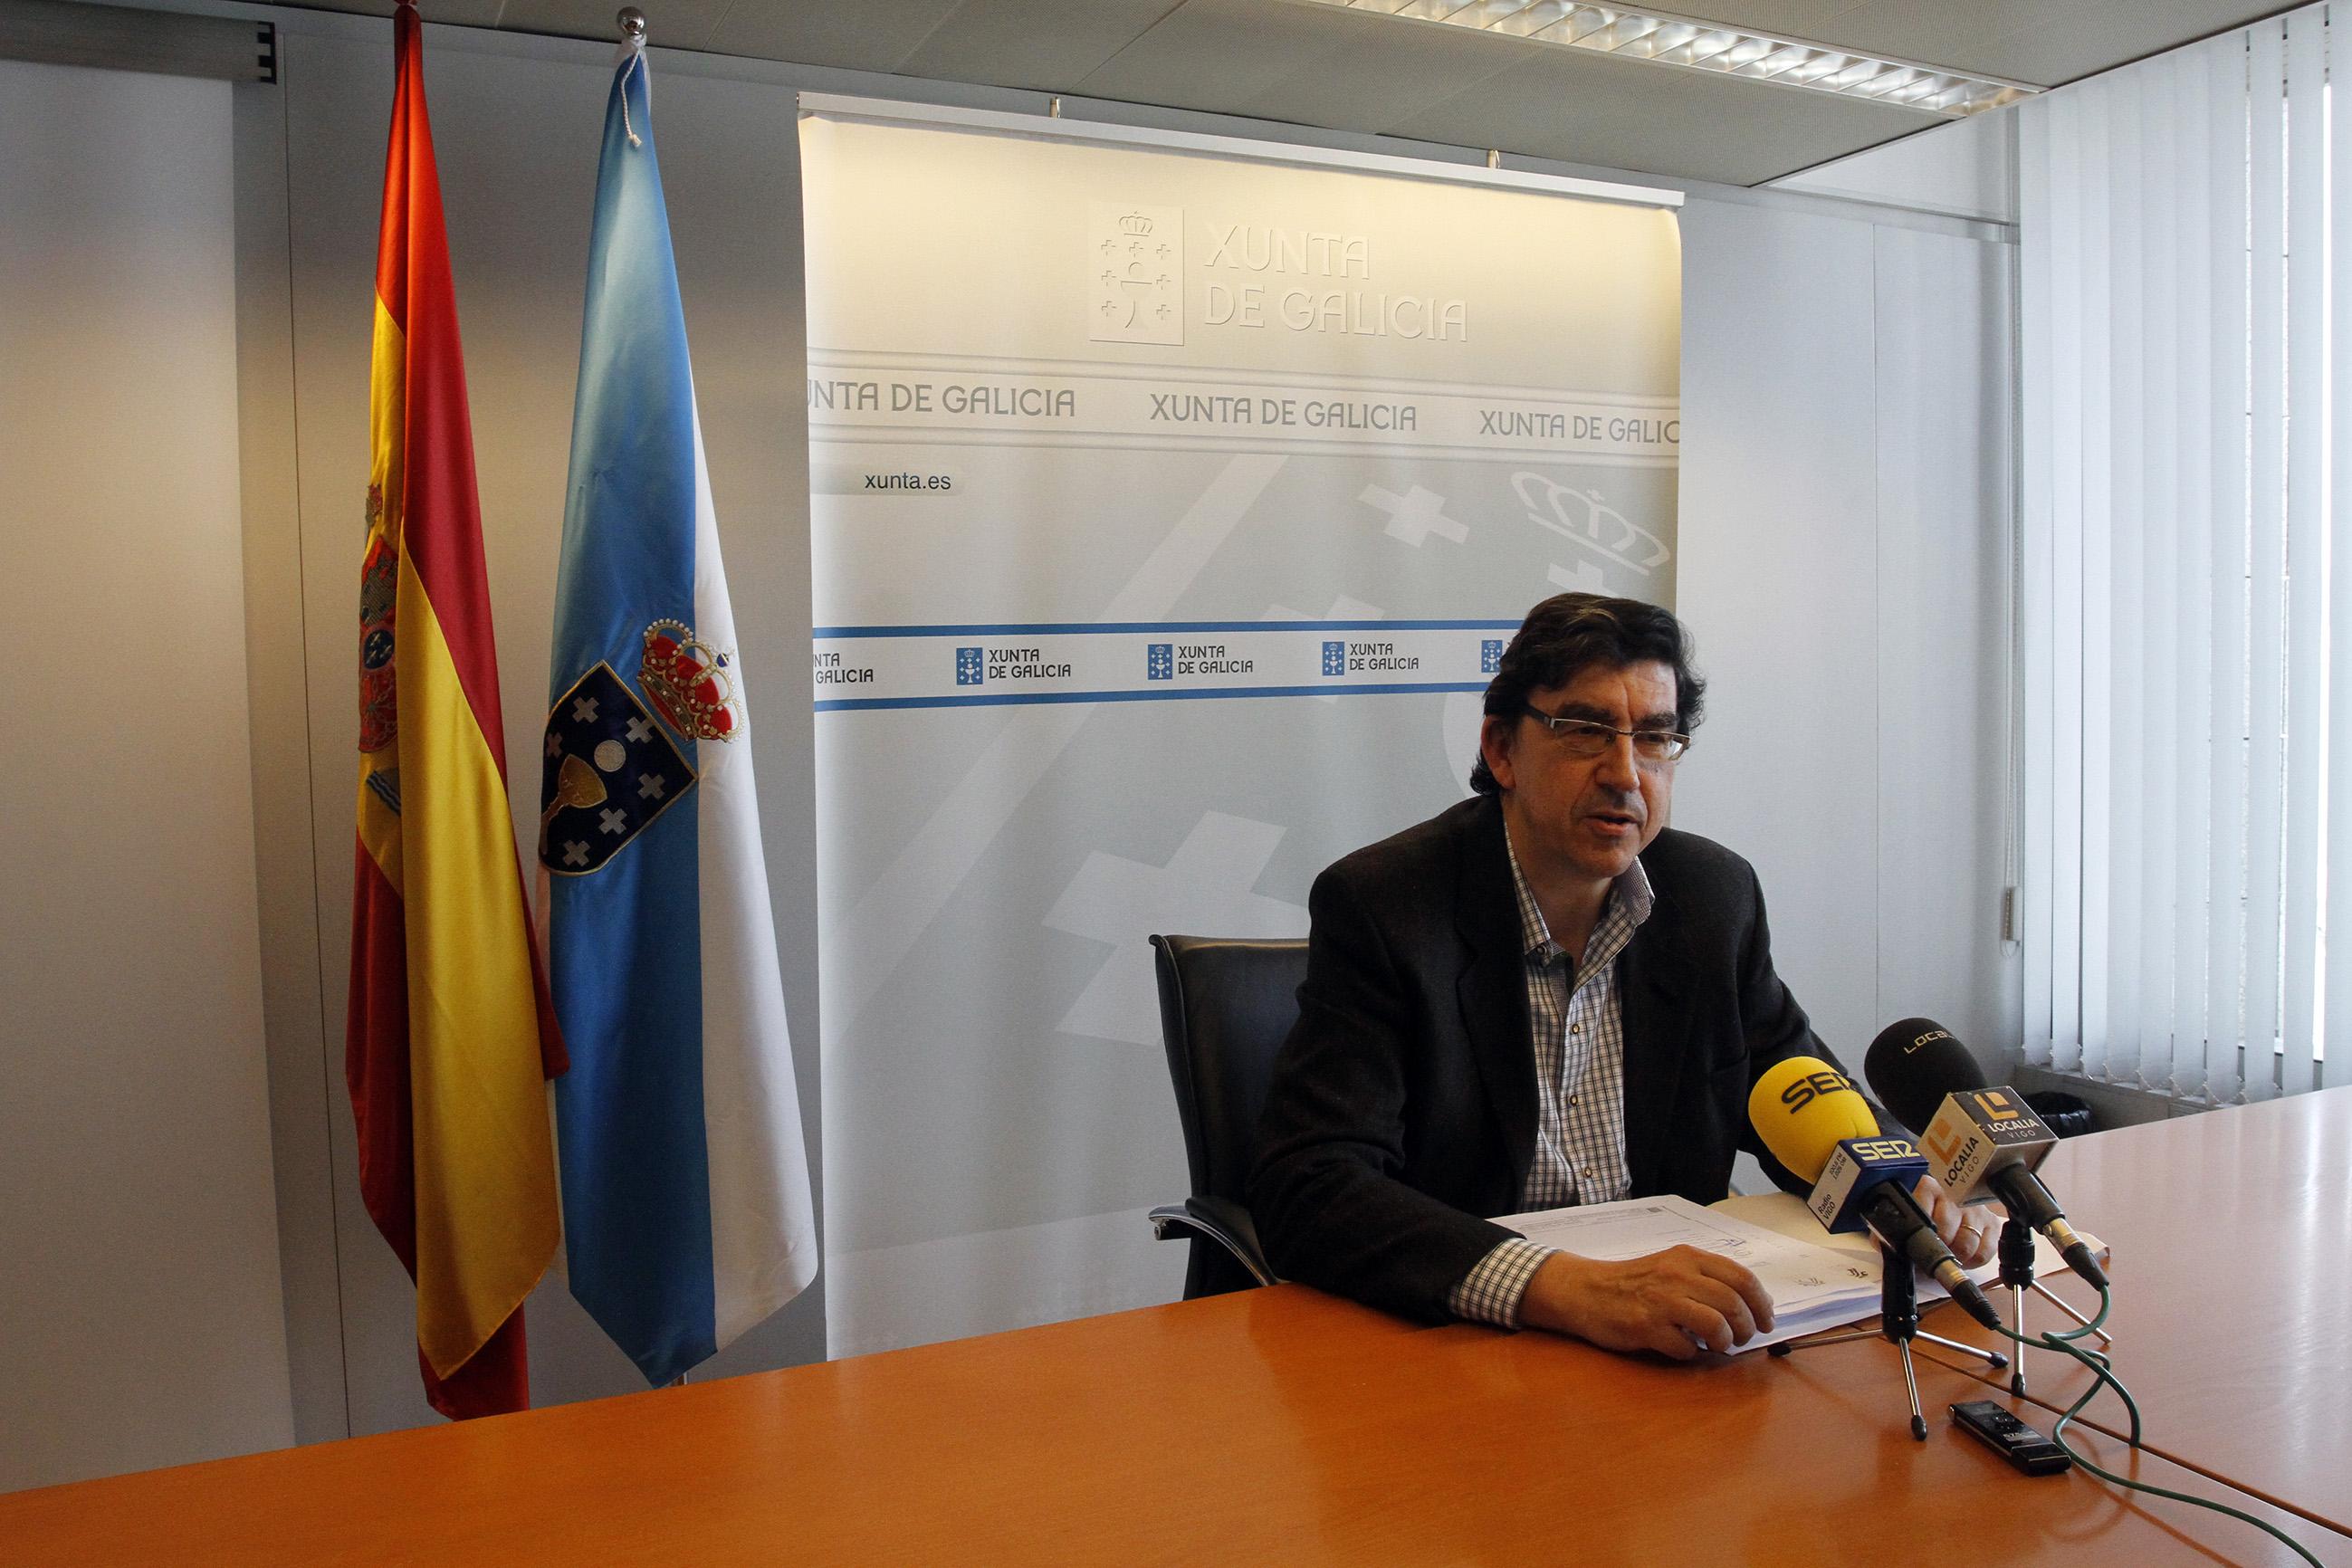 Muebles Cuinas Ribadavia - Consorcio Cascovello De Vigo Page 10[mjhdah]http://proturga.org/wp-content/uploads/2017/04/IMG-20170331-WA0013.jpg